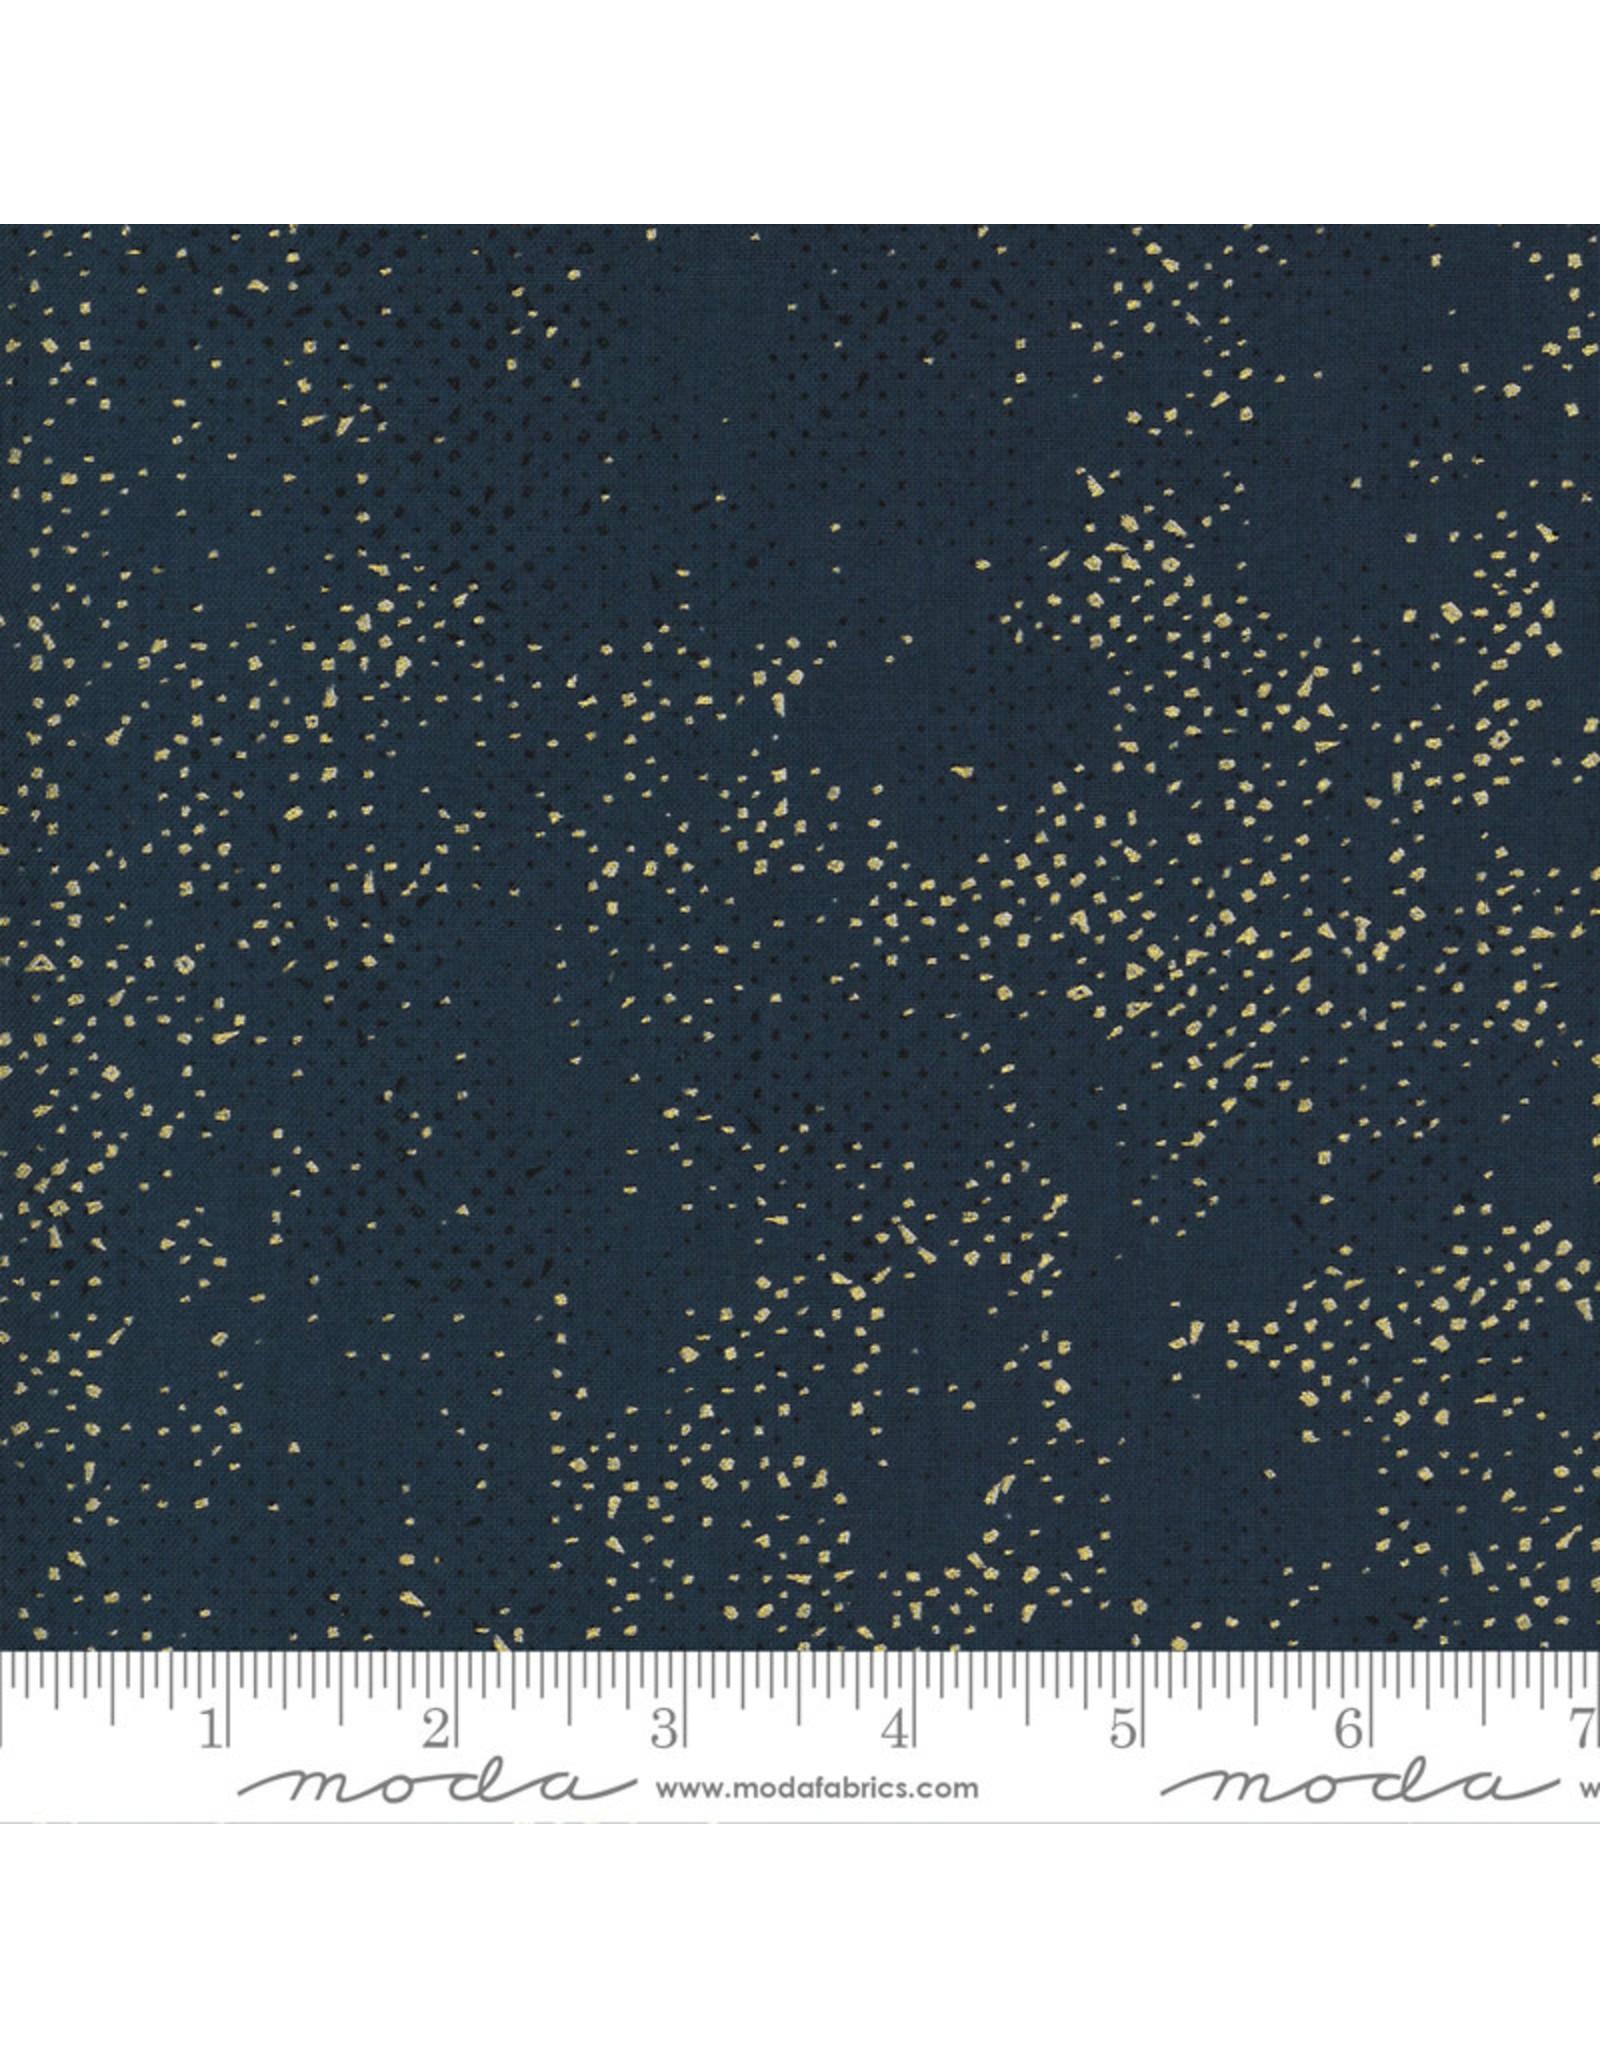 Zen Chic Dance in Paris, Spotted Dots in Navy with Metallic, Fabric Half-Yards